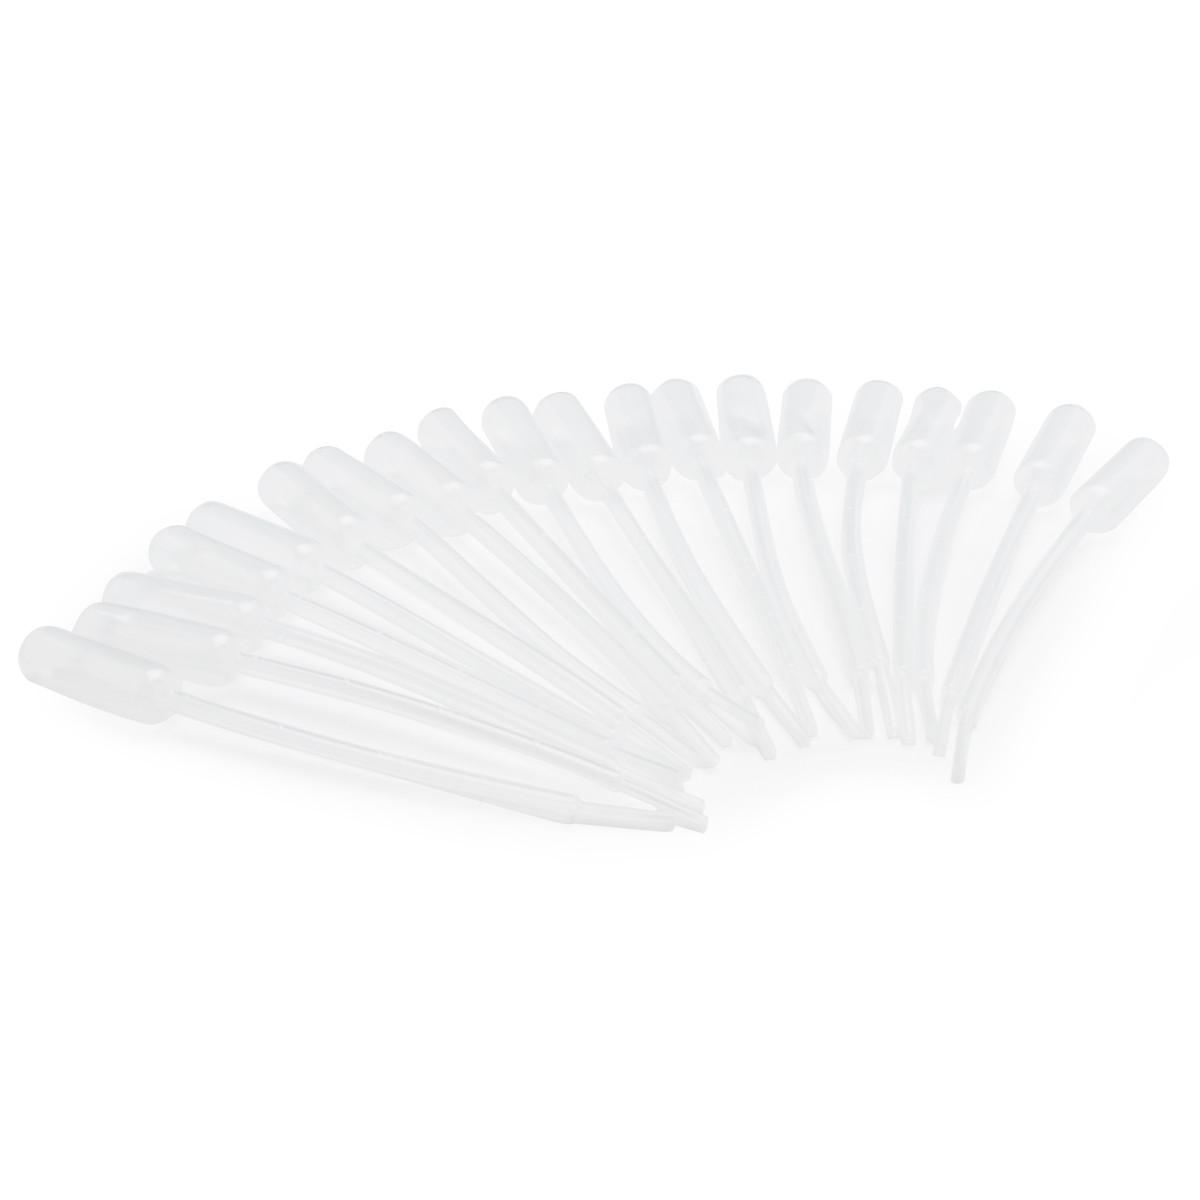 Electrode Refilling Pipettes (20 pcs.)